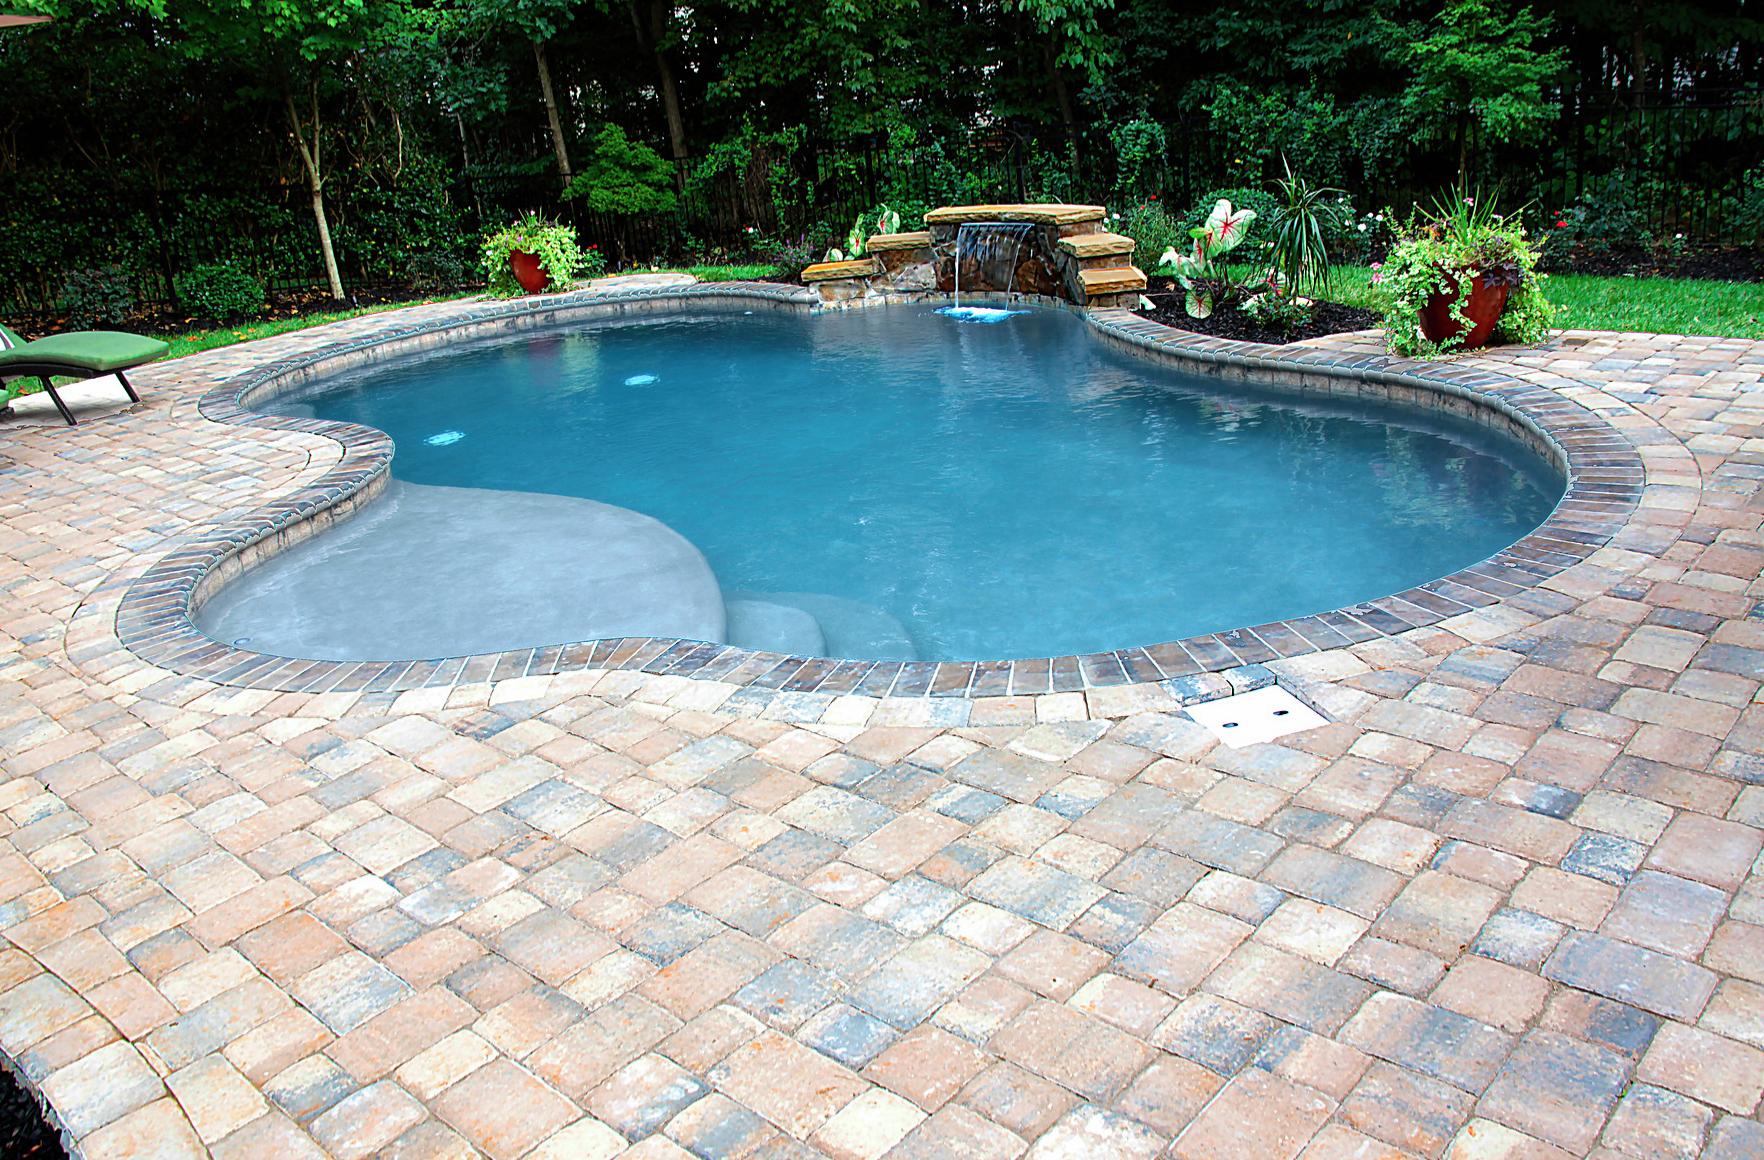 Corneilus Concrete Inground Pools Installed By CPC Pools in North Carolina 704-799-5236